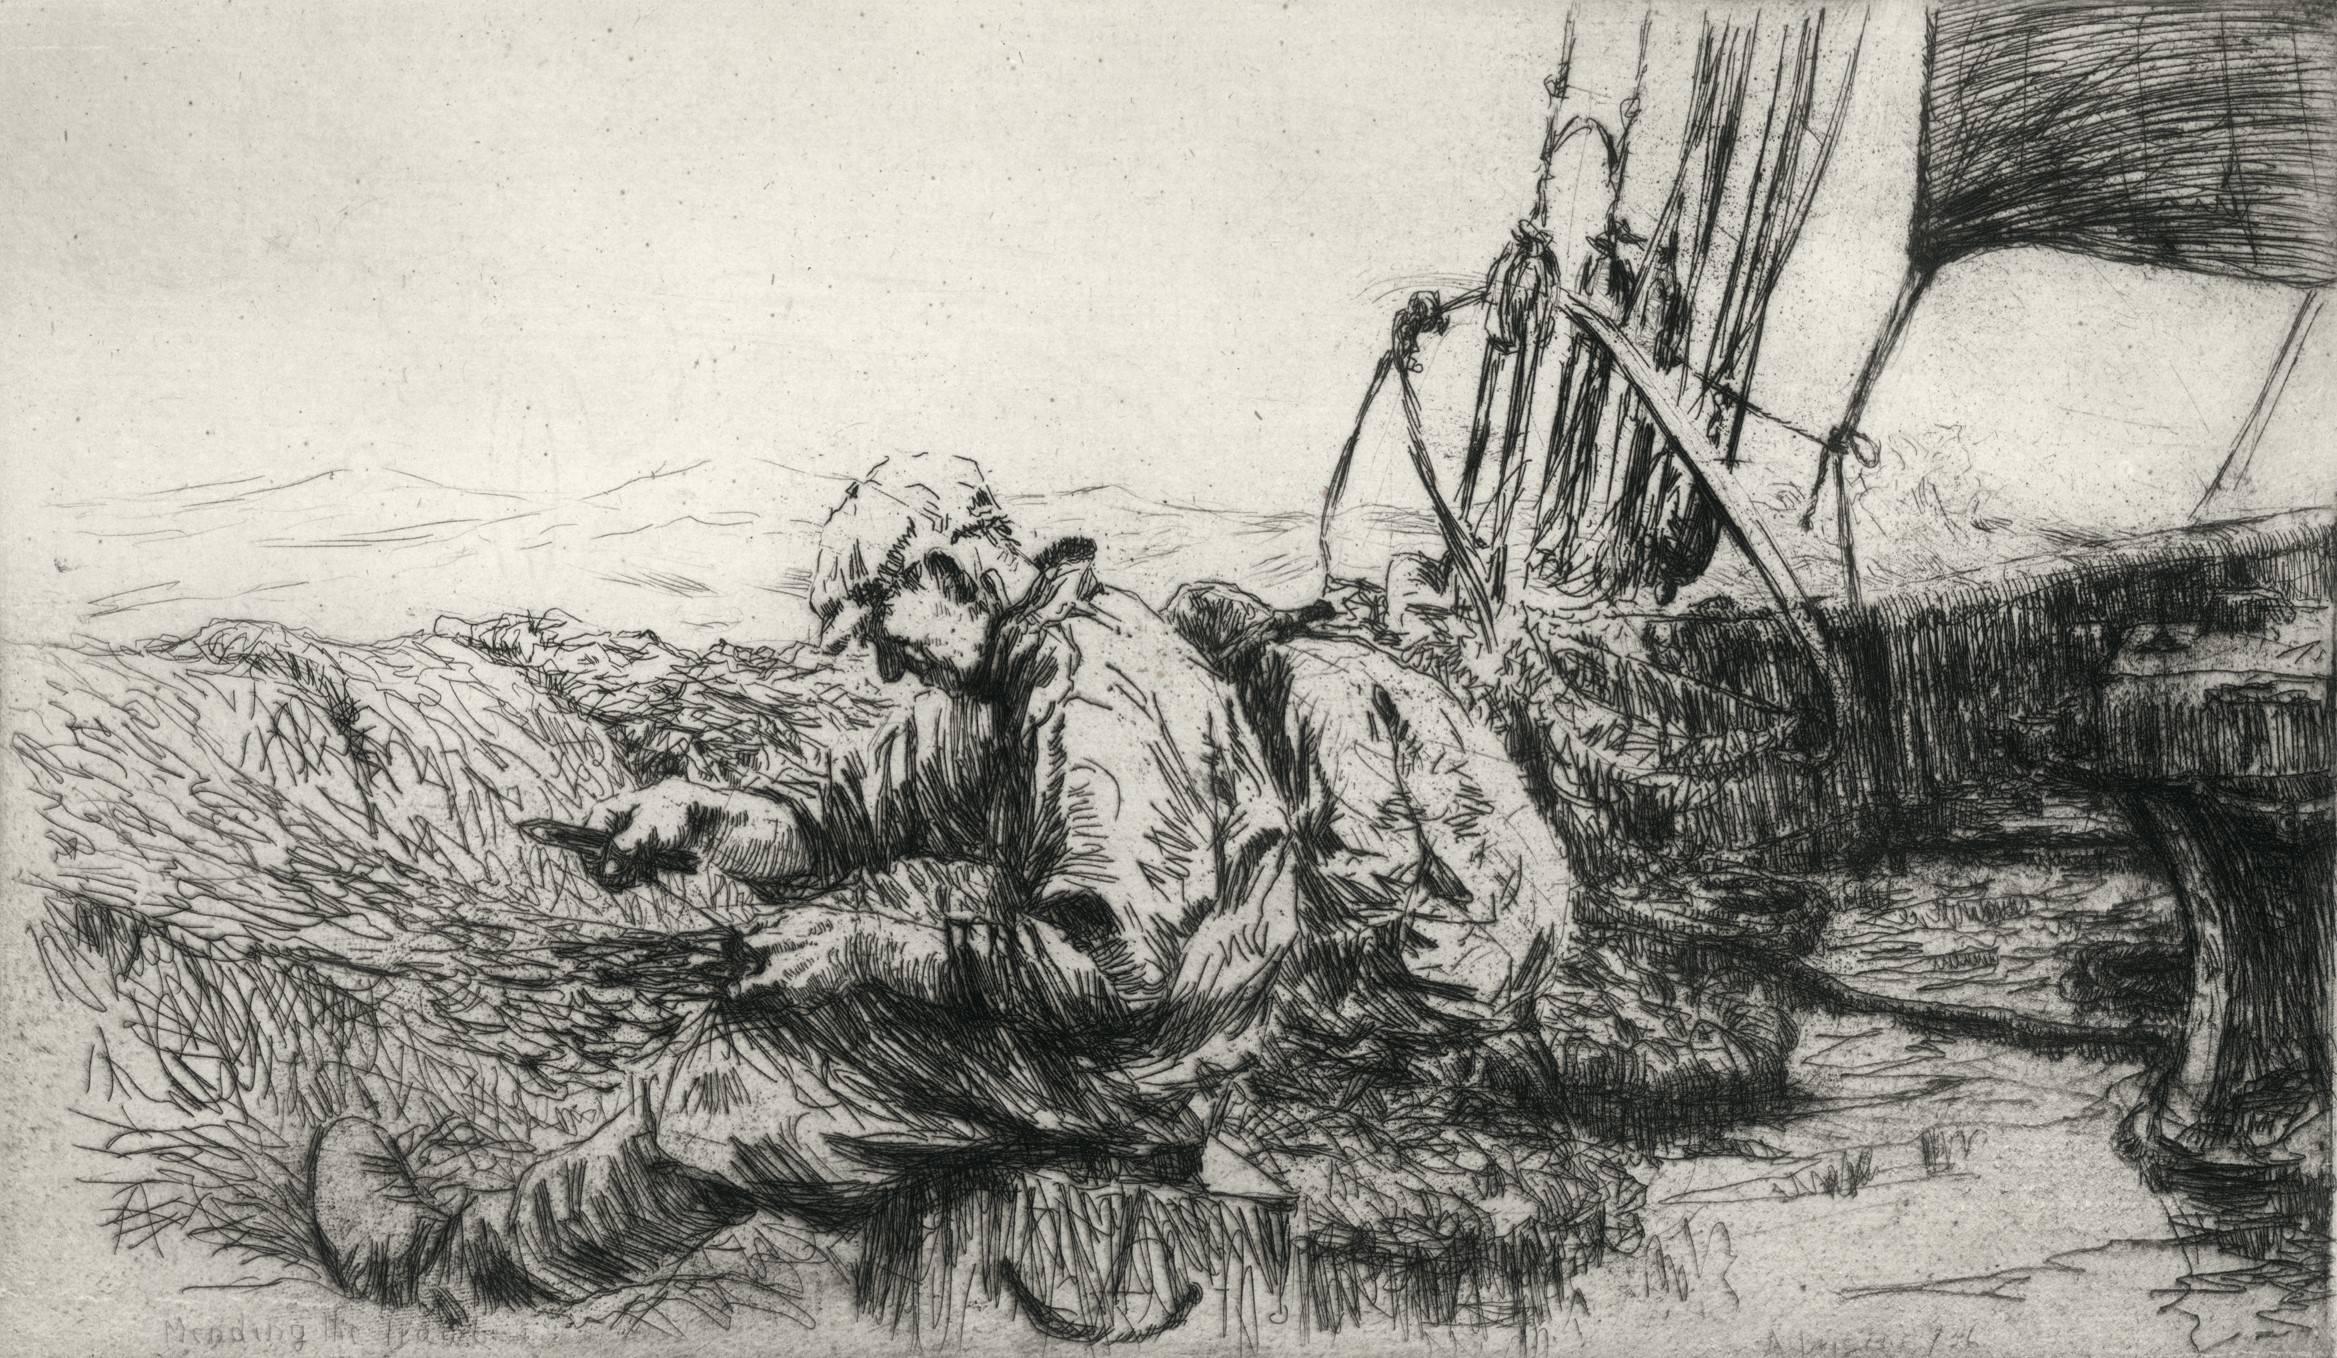 Mending the Trawl, plate 3.